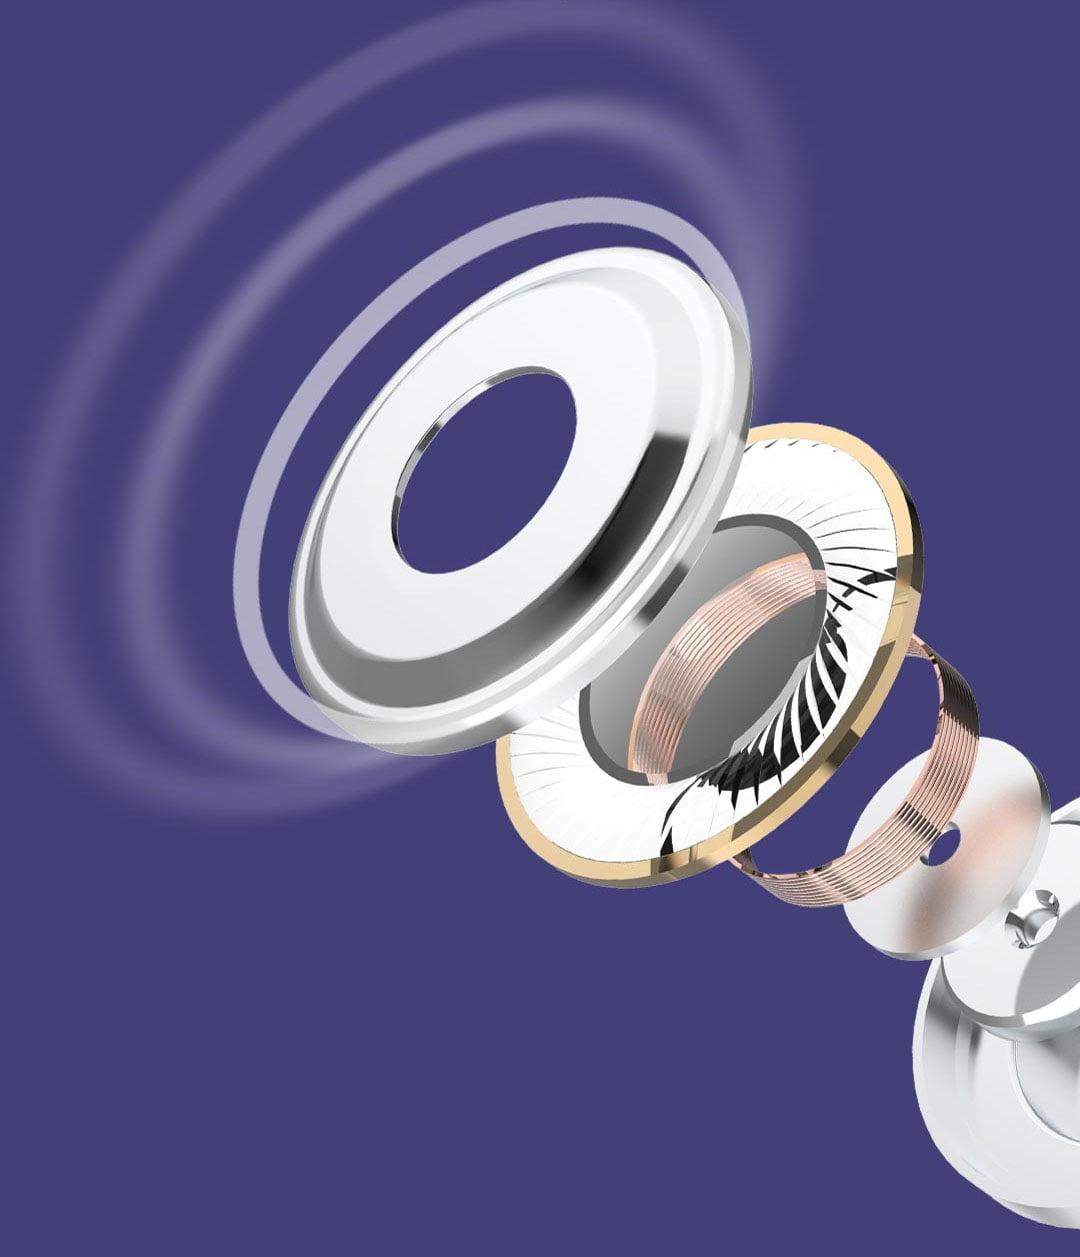 tai nghe bluetooth true wireless qcy t8s 605062ba5bae6